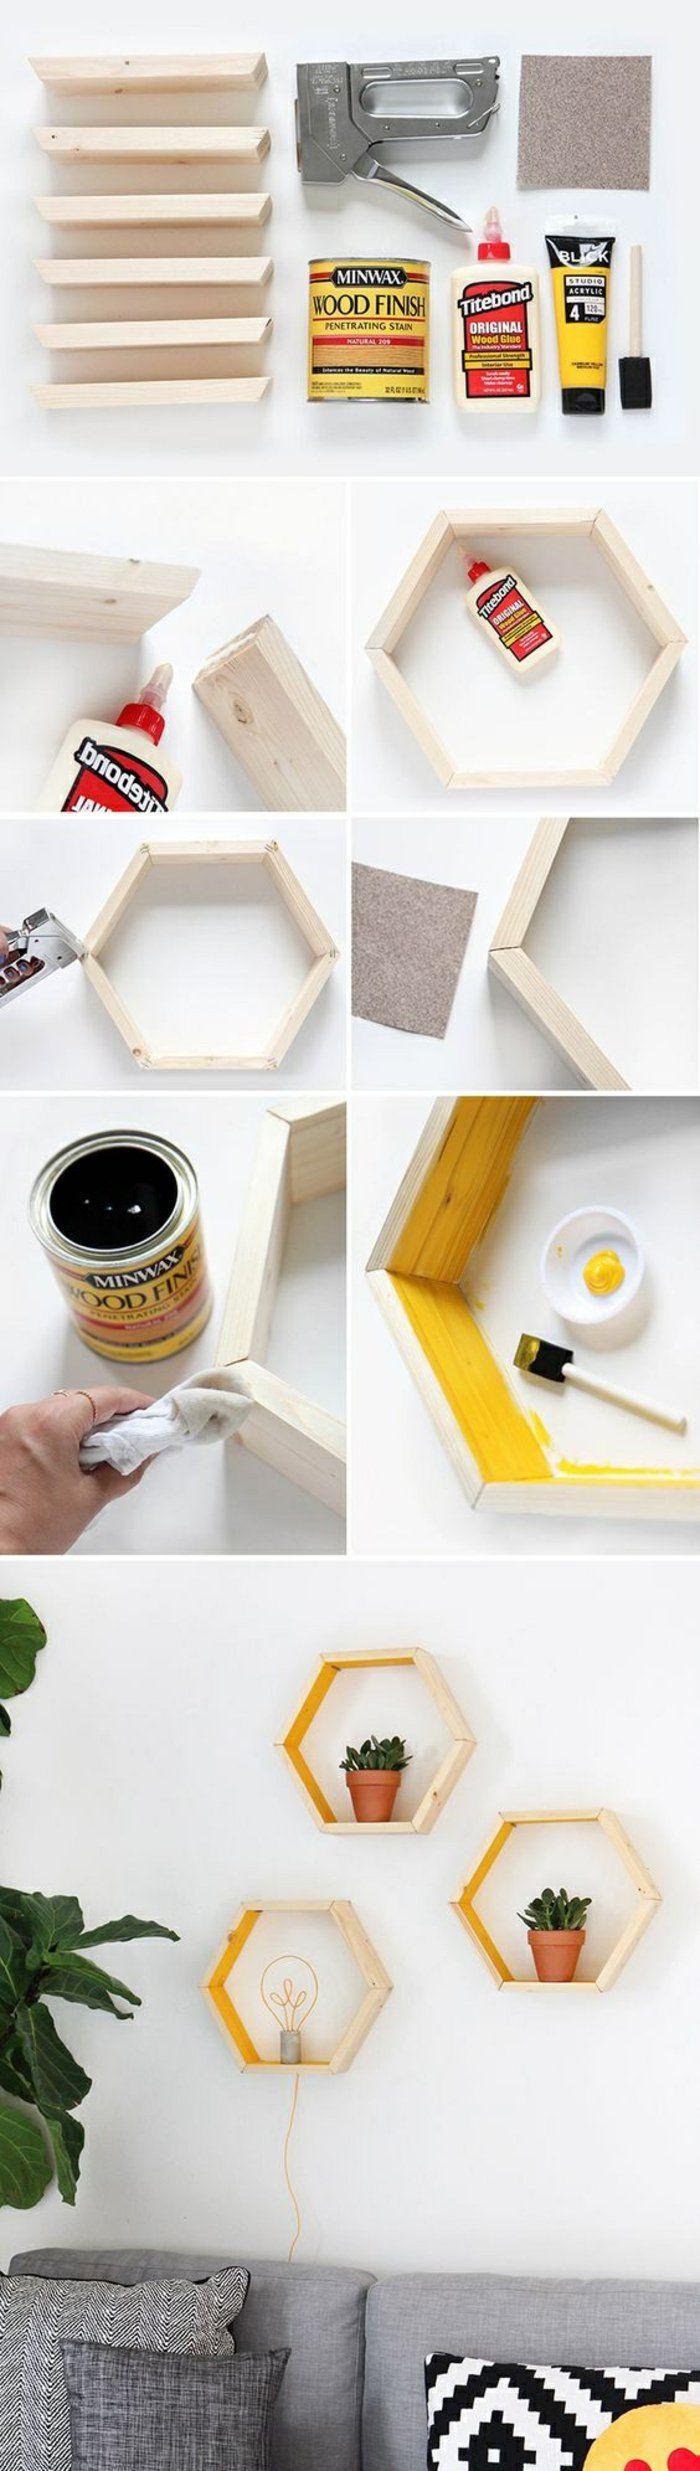 2 Küchenregal Selber Bauen Regale Aus Holz Farbe Kleber Pflanzen Sofa Kissen